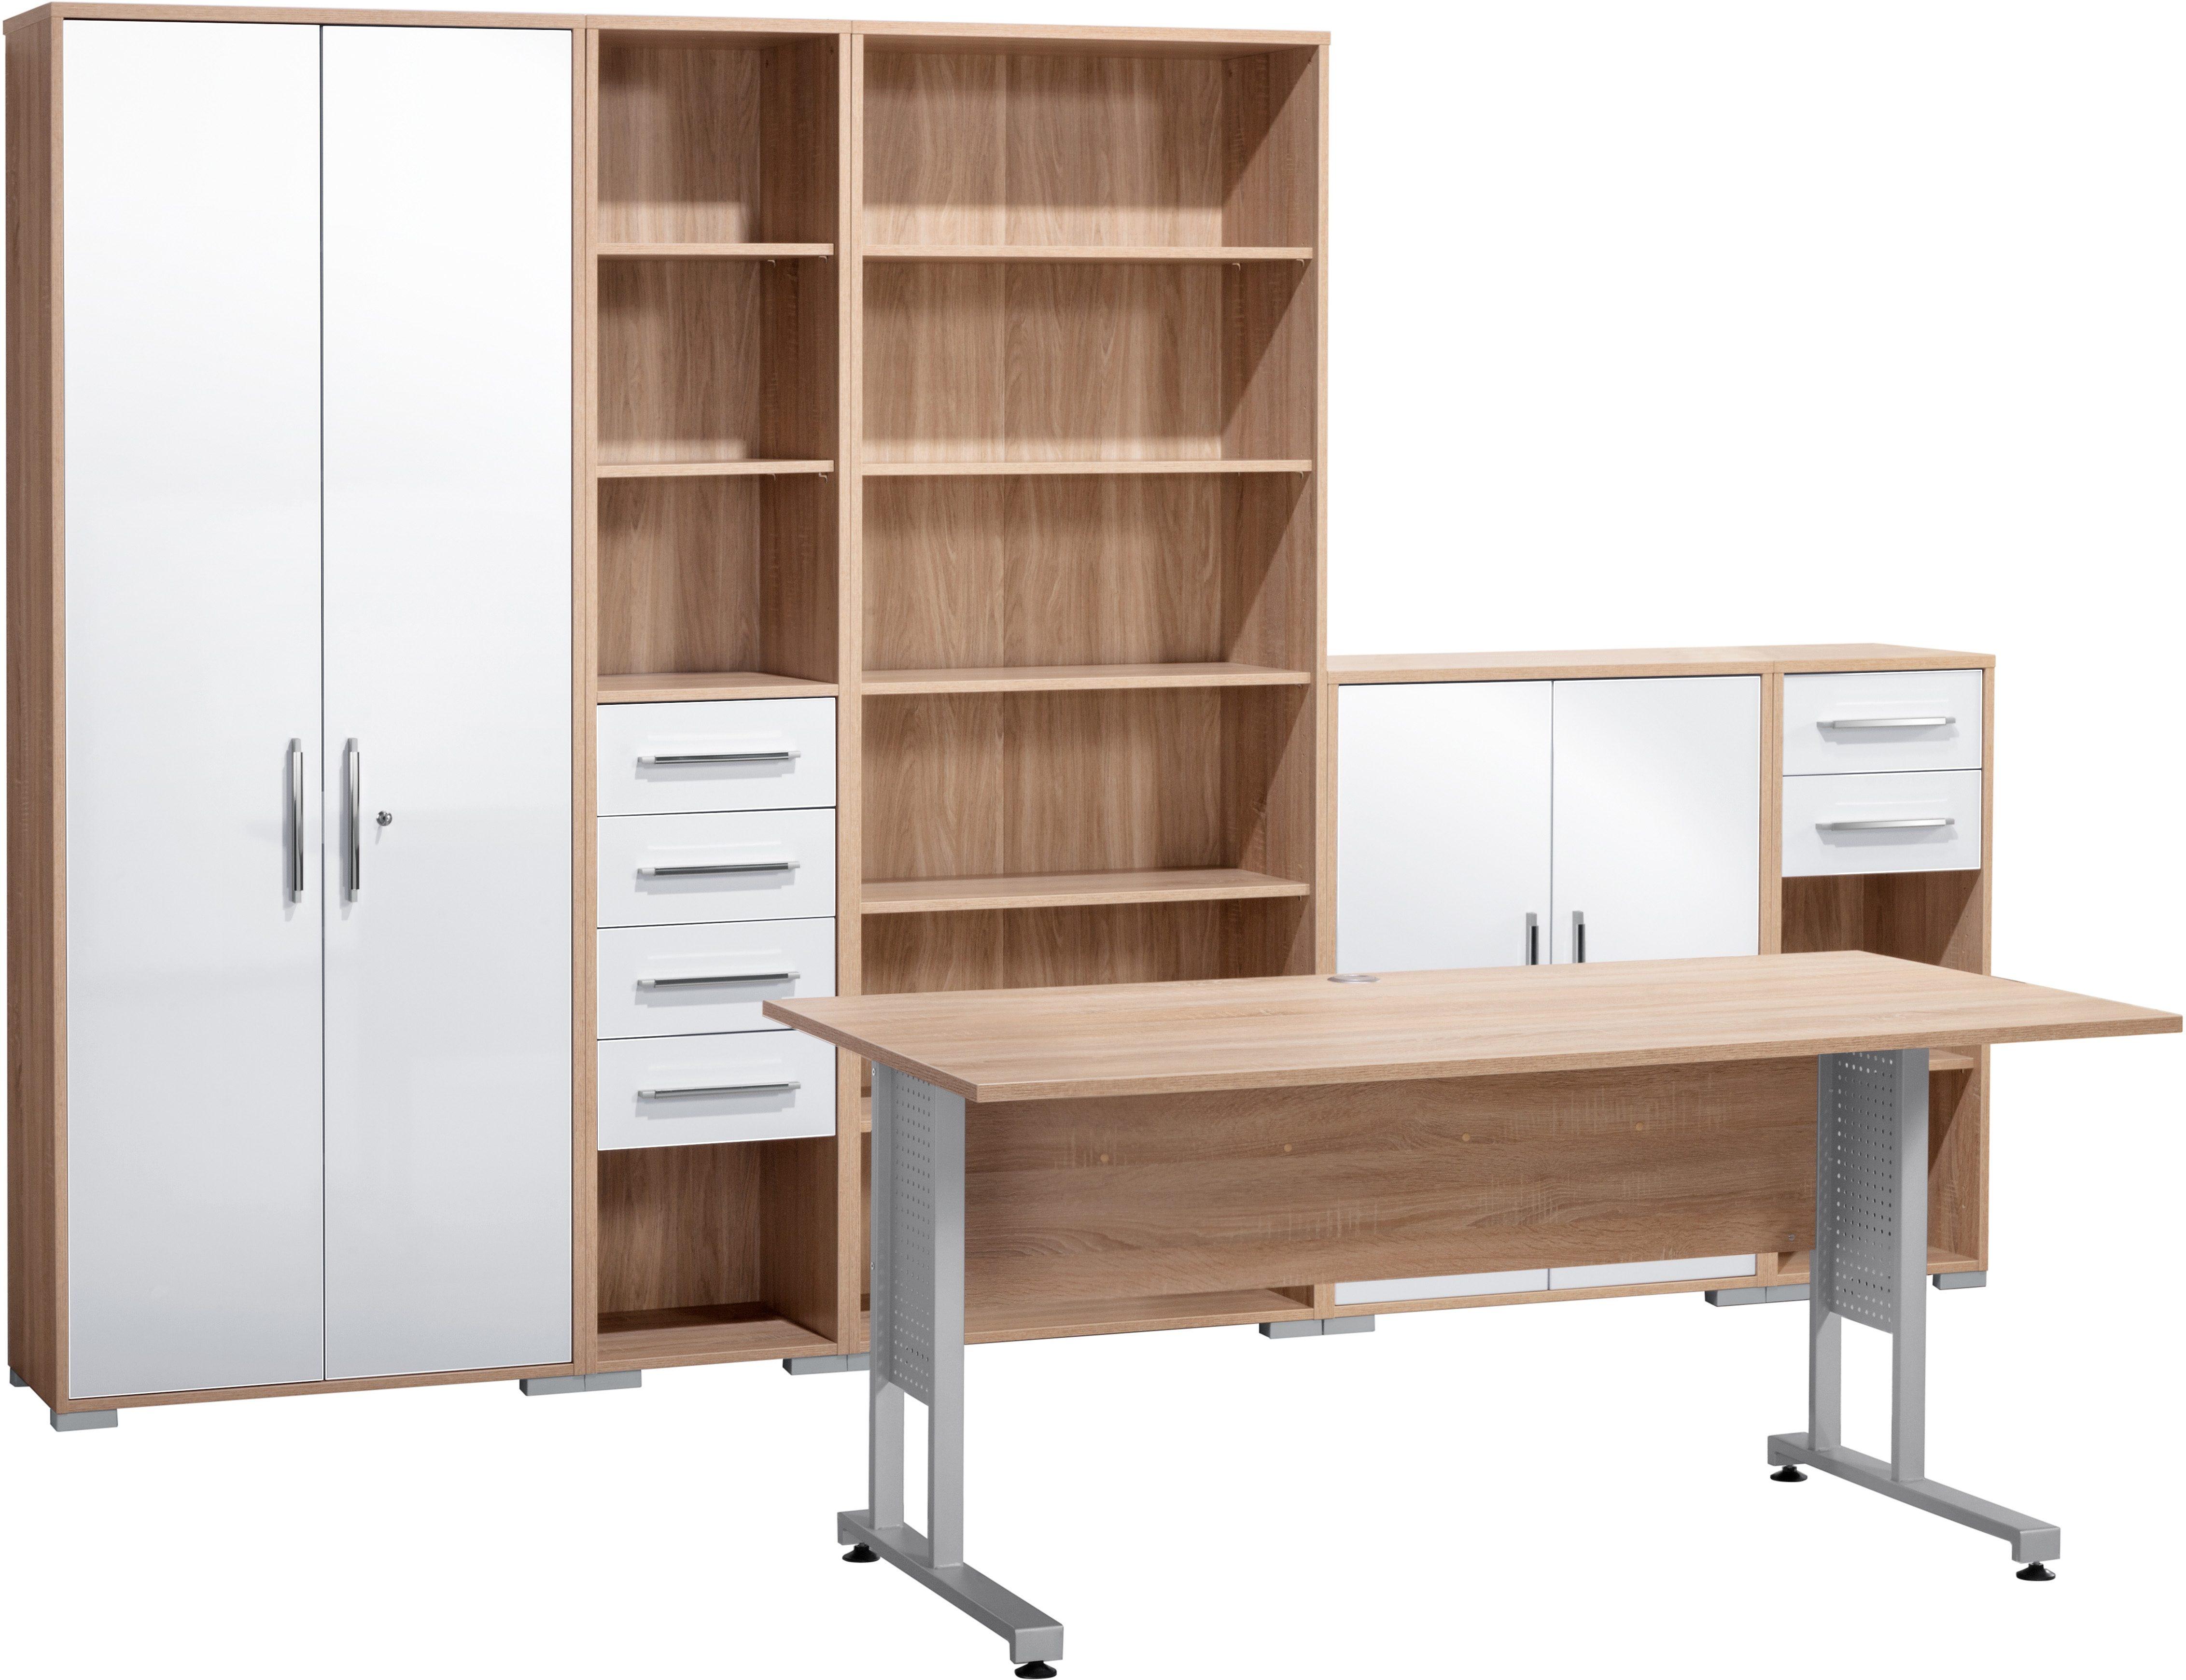 Maja Möbel Büro-Set 1200 (Set 6-tlg)   Büro > Büromöbel-Serien   Maja Möbel